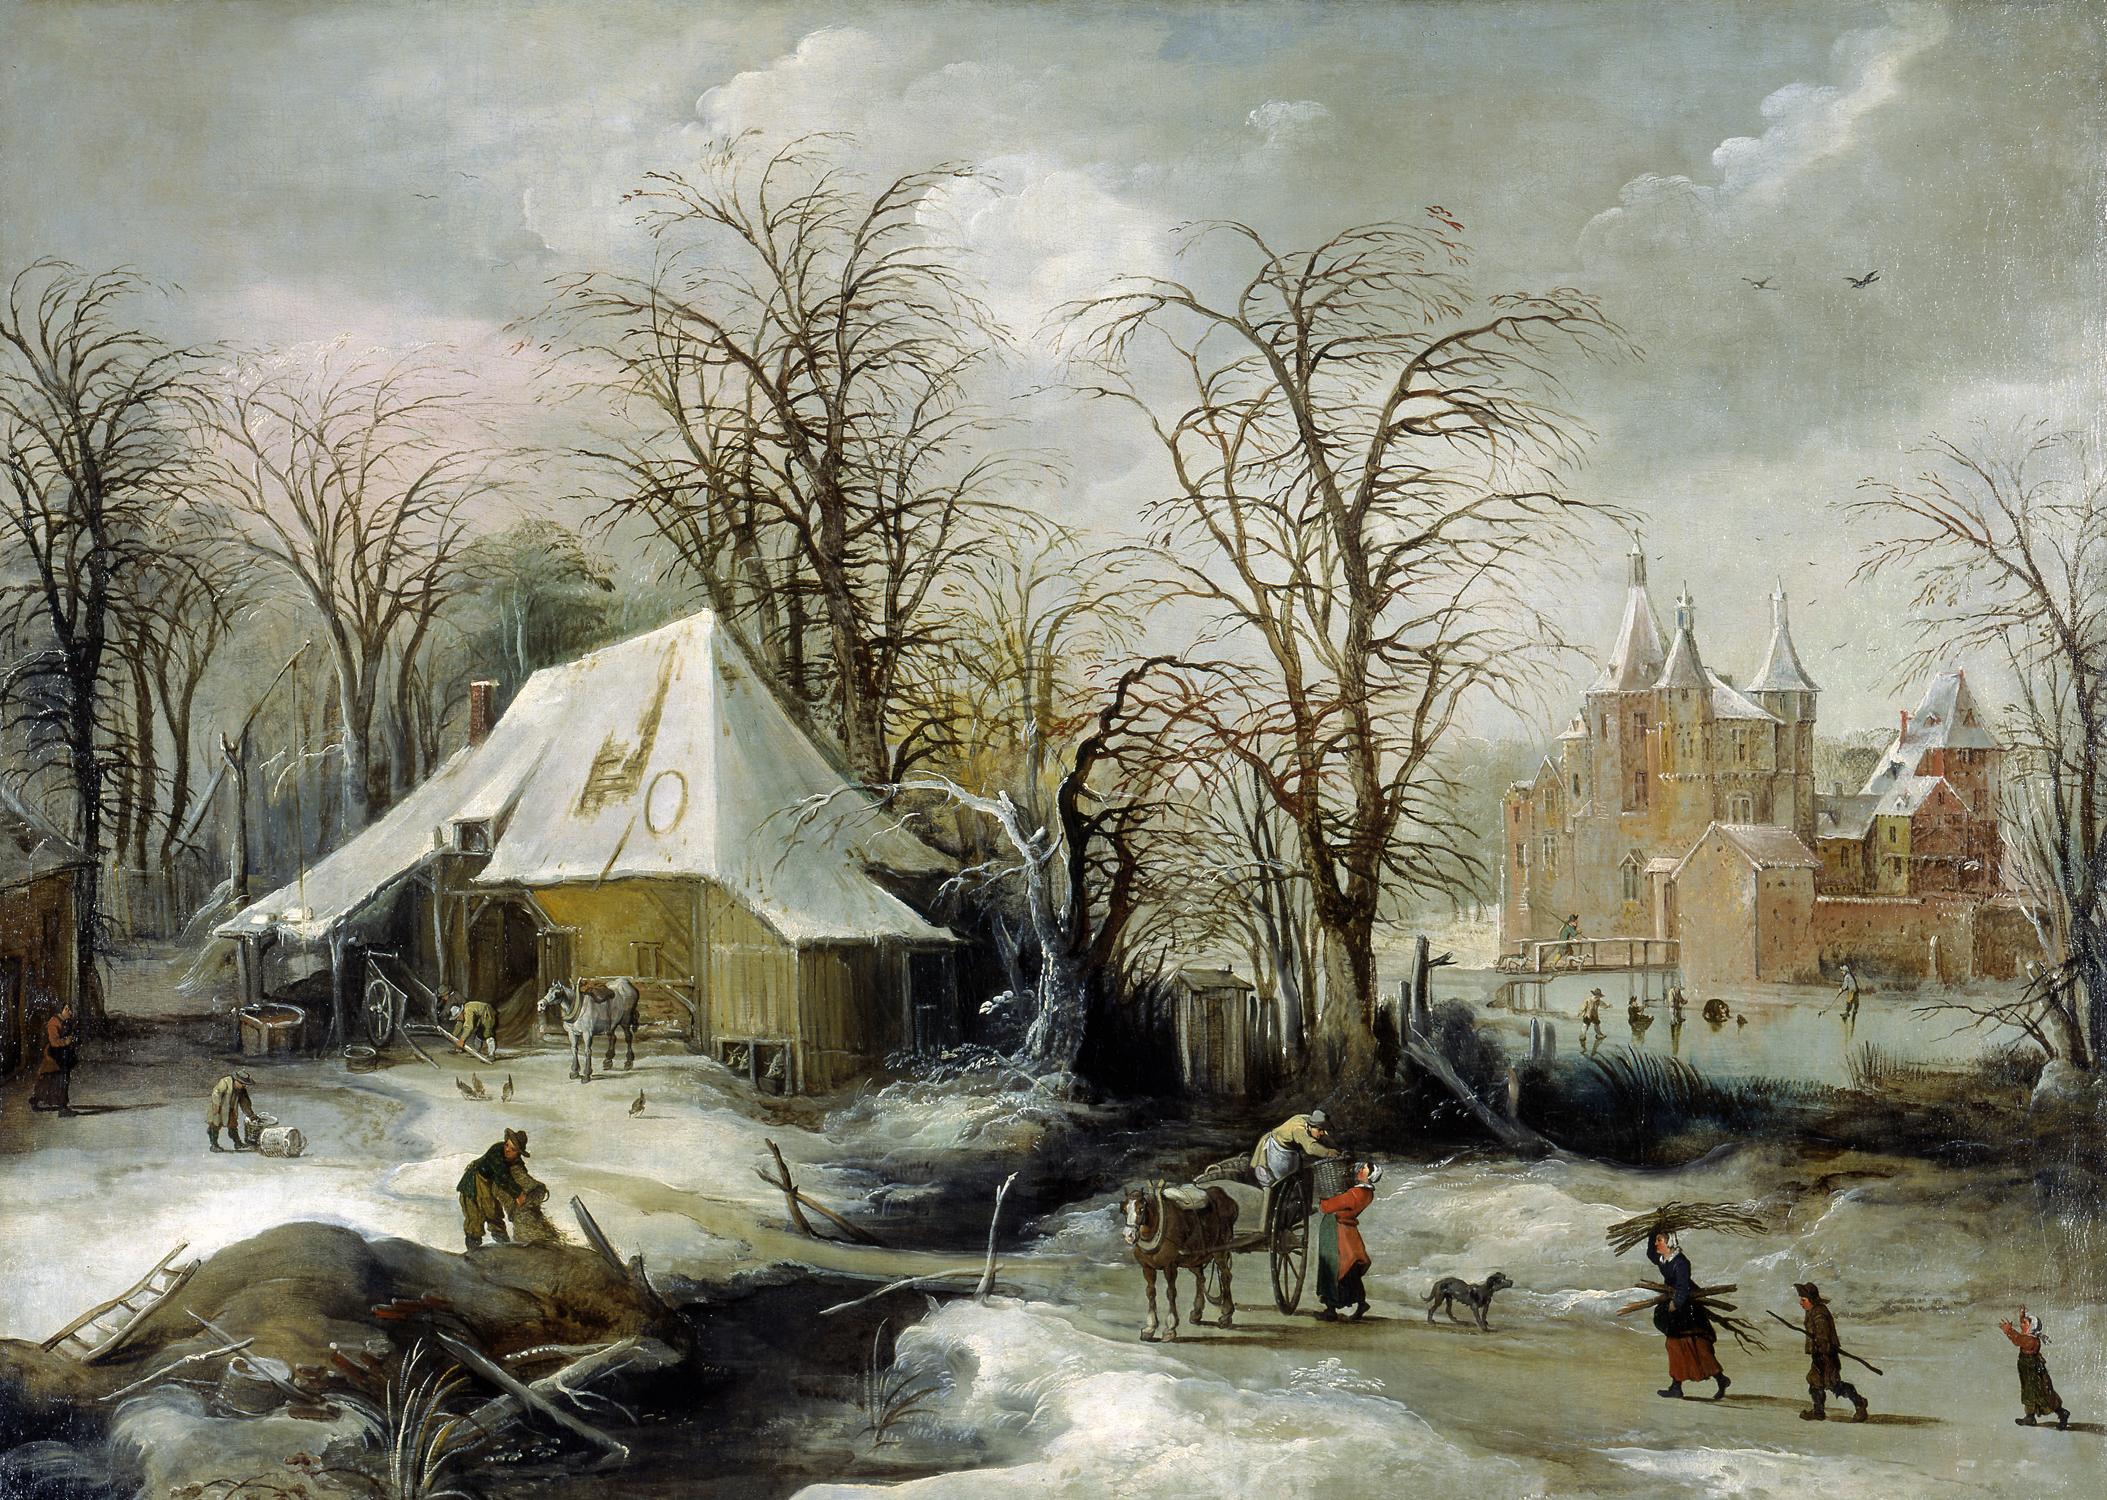 winter | Euro Palace Casino Blog